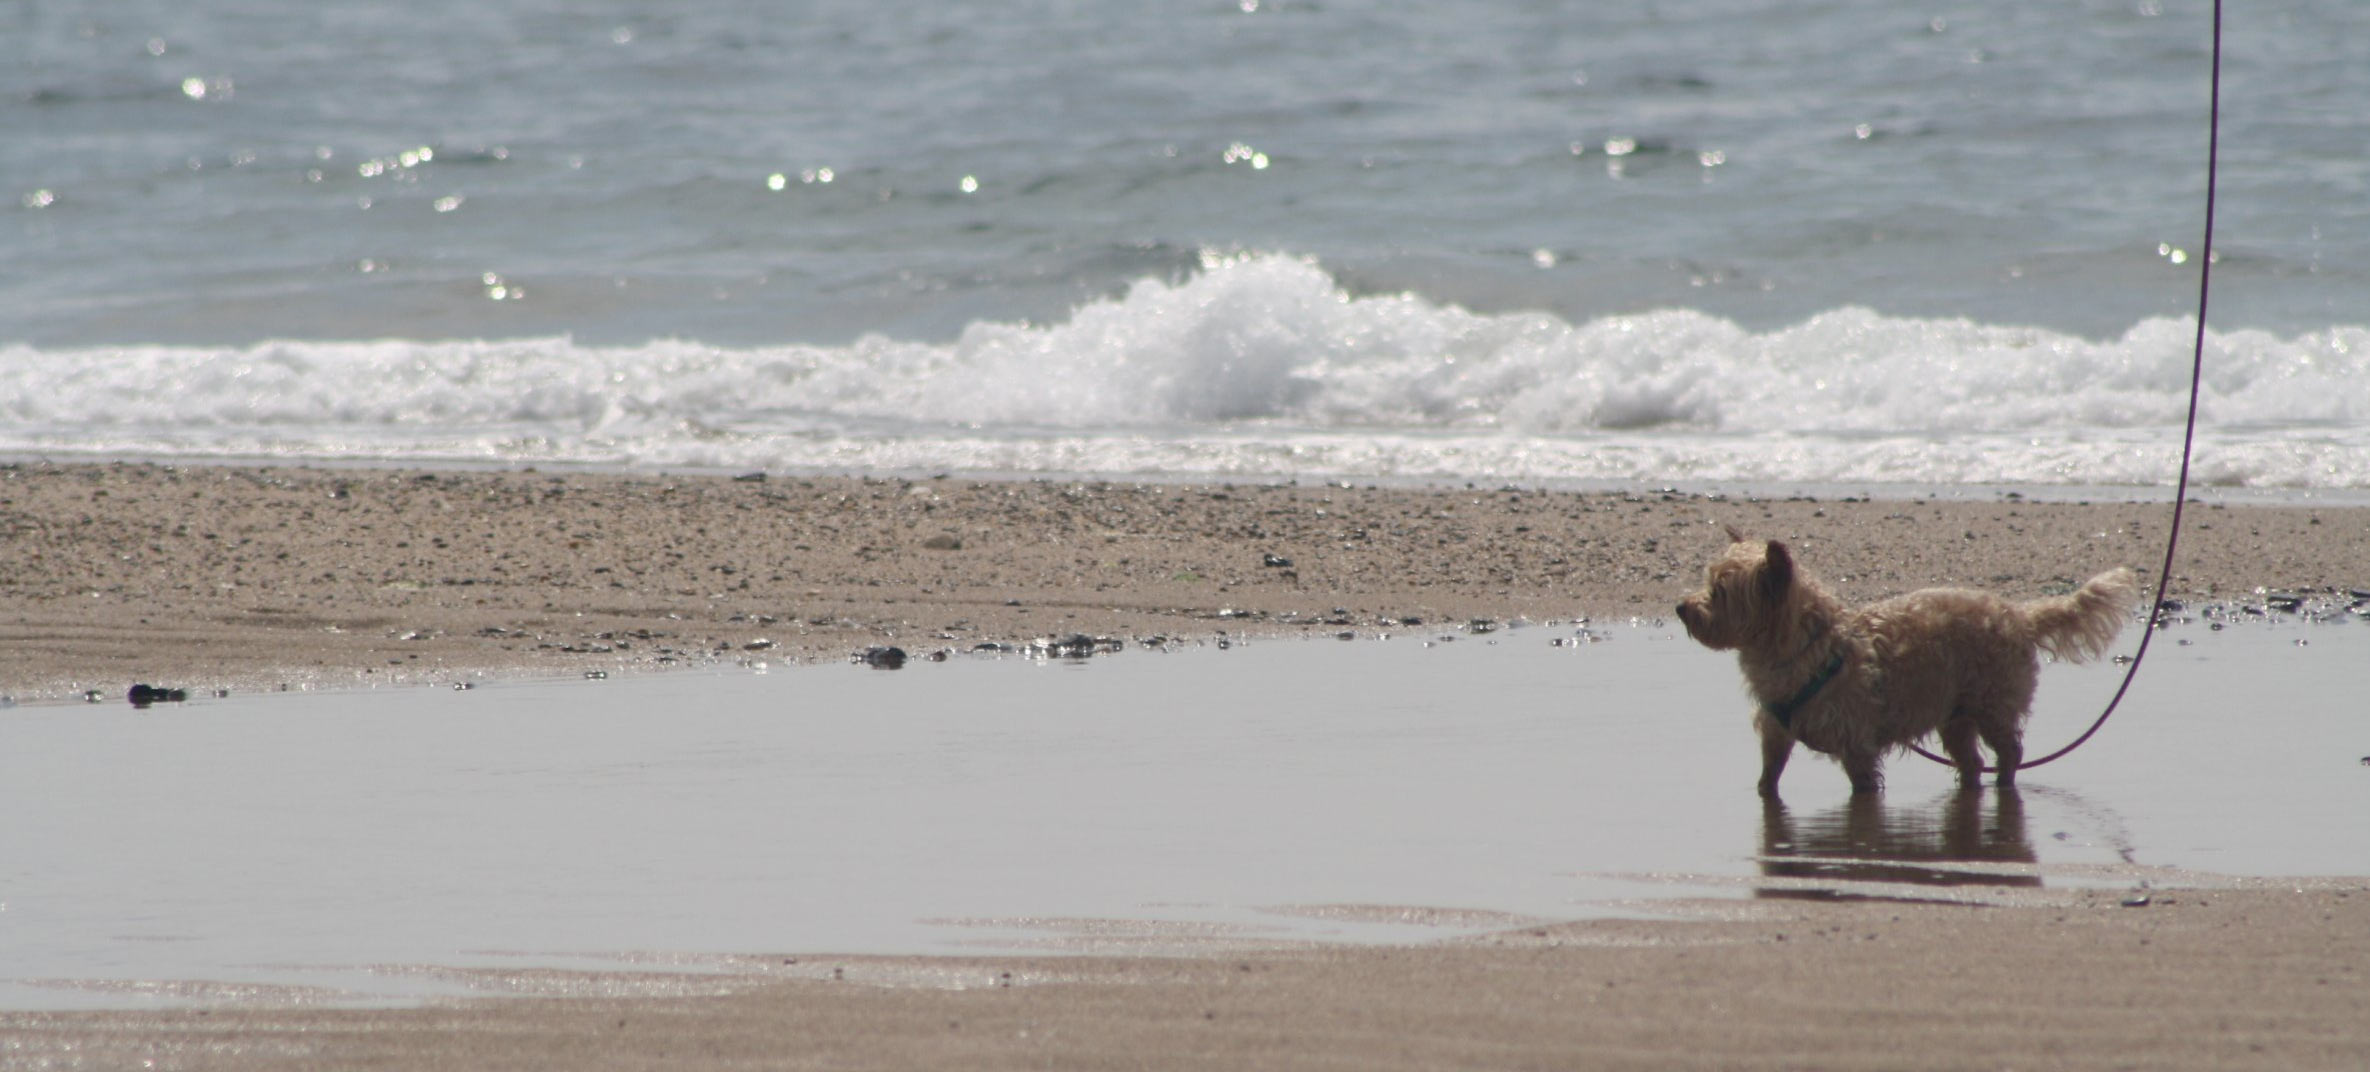 A small dog watches from a sandbar on a beach in Yarmouth, MA